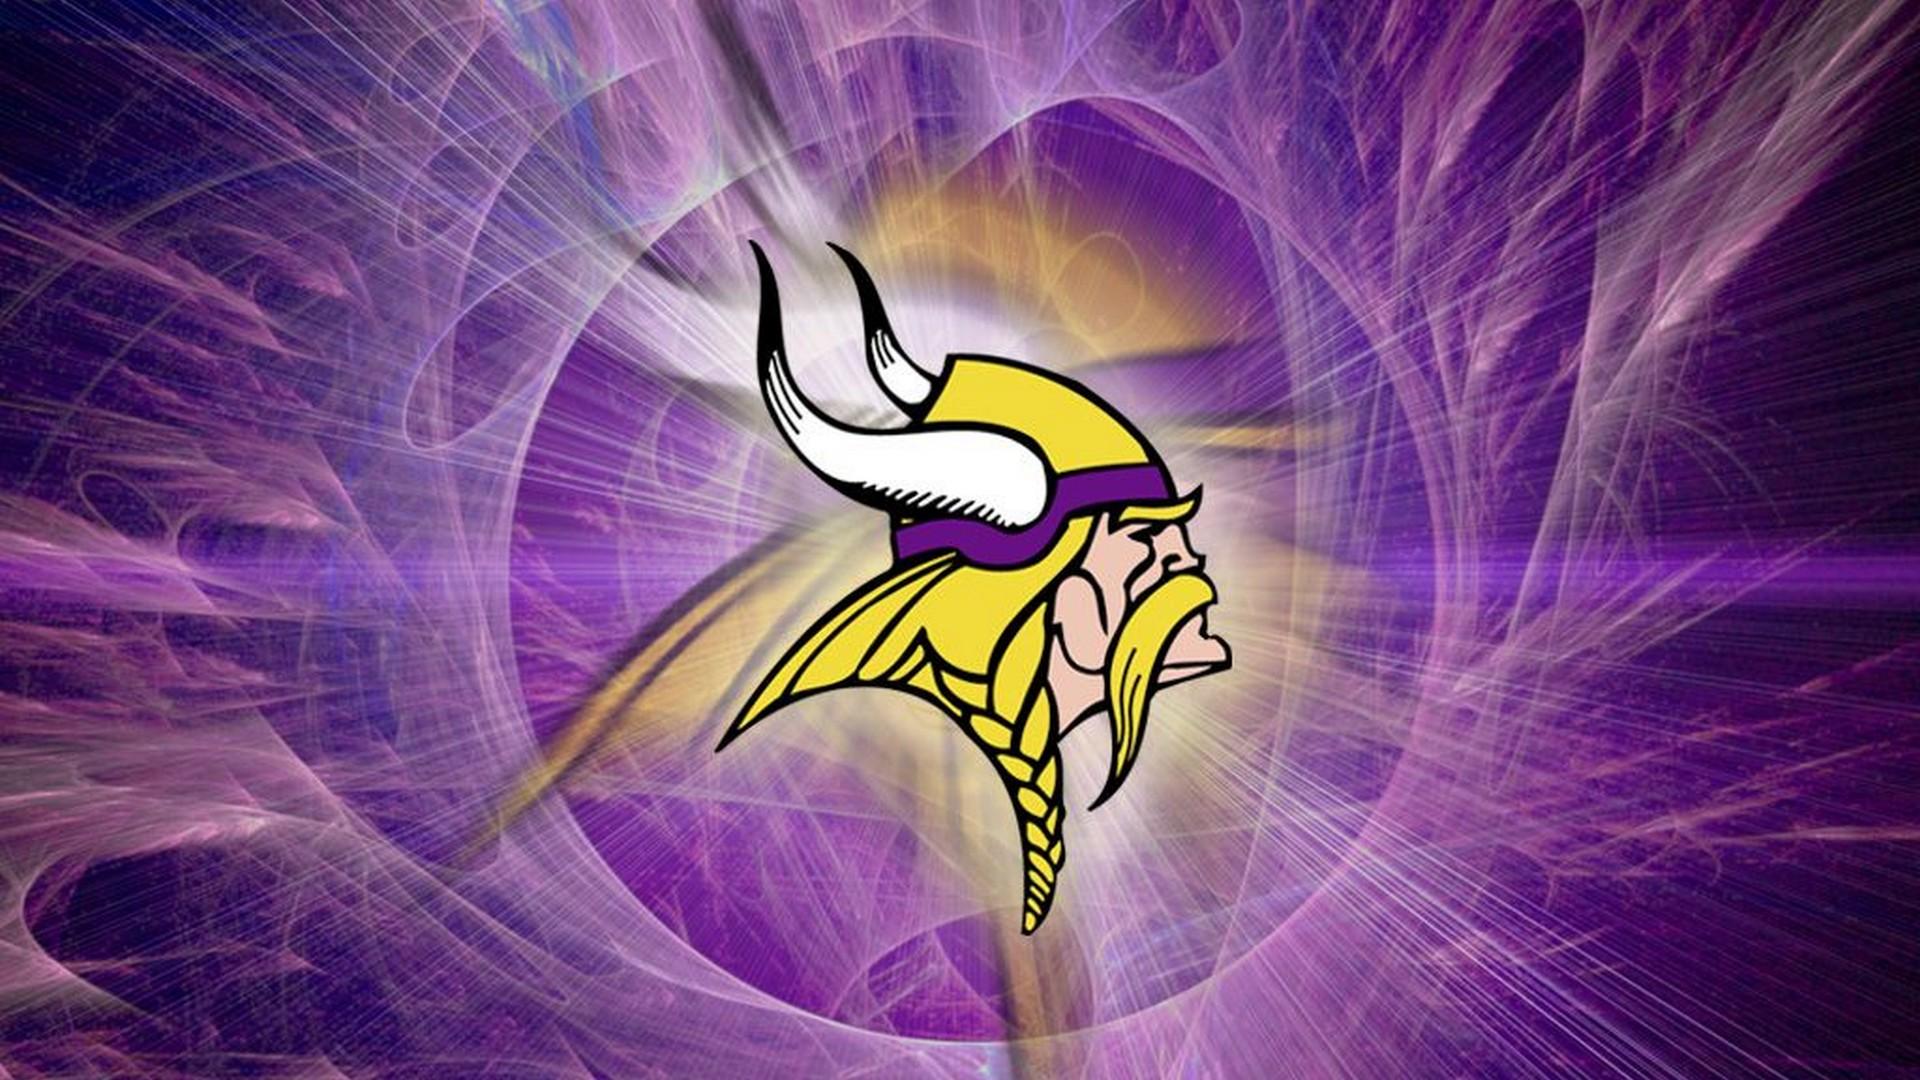 Minnesota Vikings For Desktop Wallpaper 2019 NFL Football Wallpapers 1920x1080